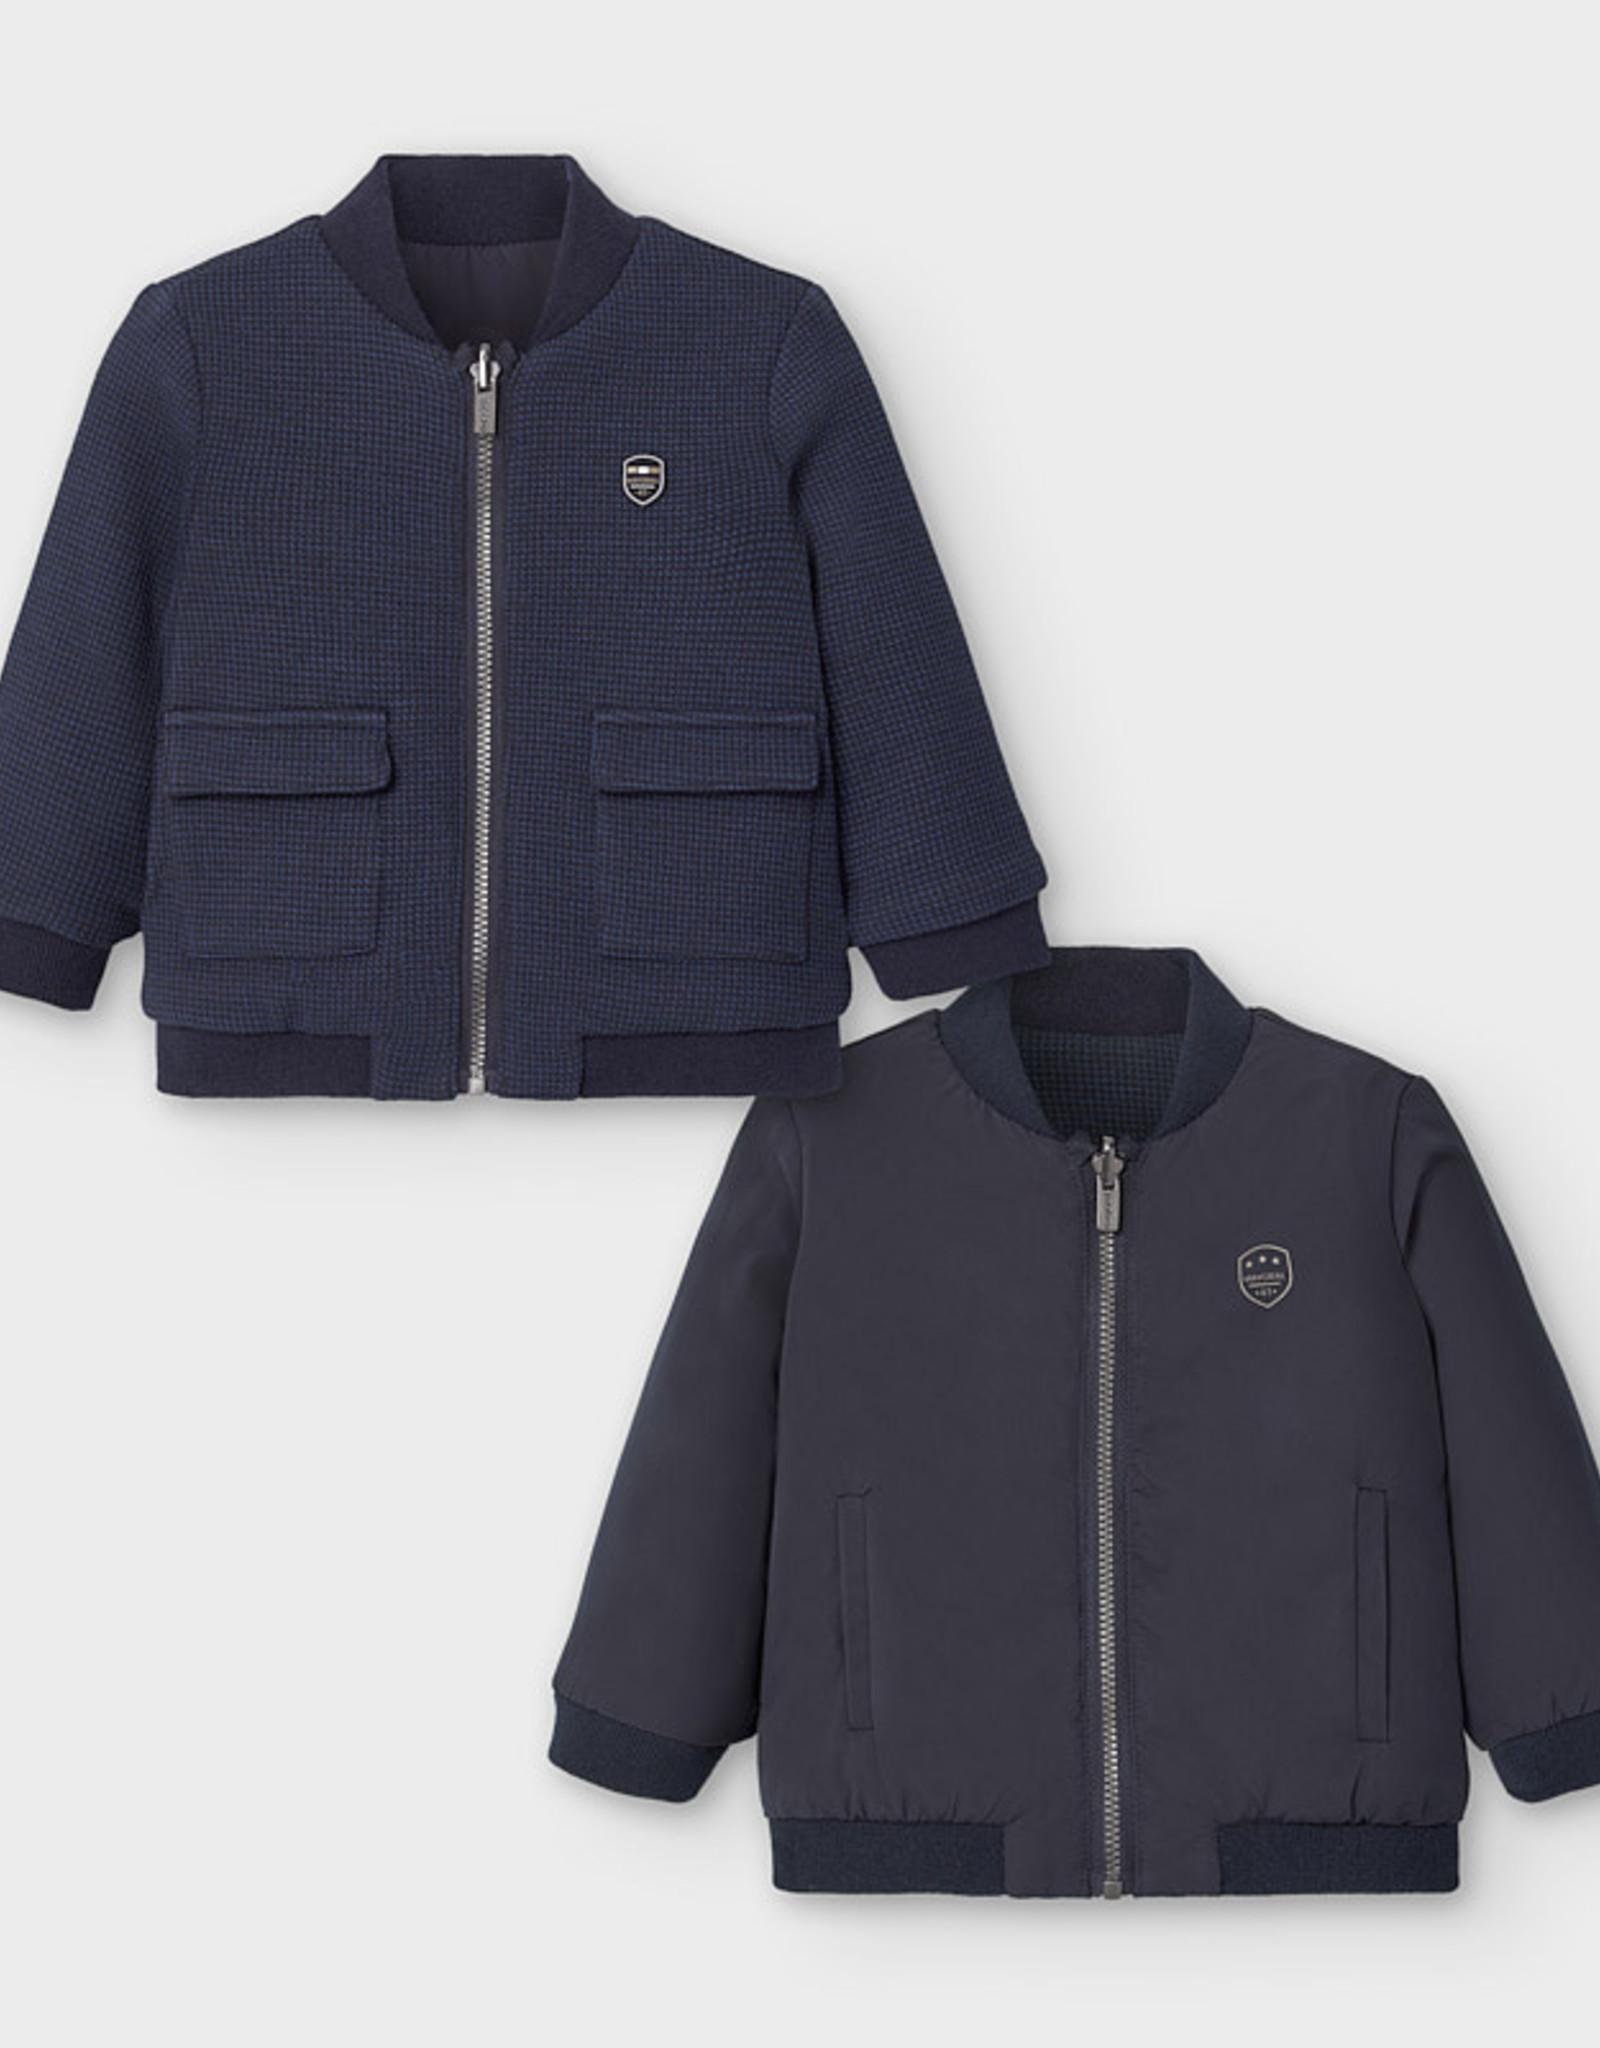 Mayoral FA20 Navy Reversible Jacket